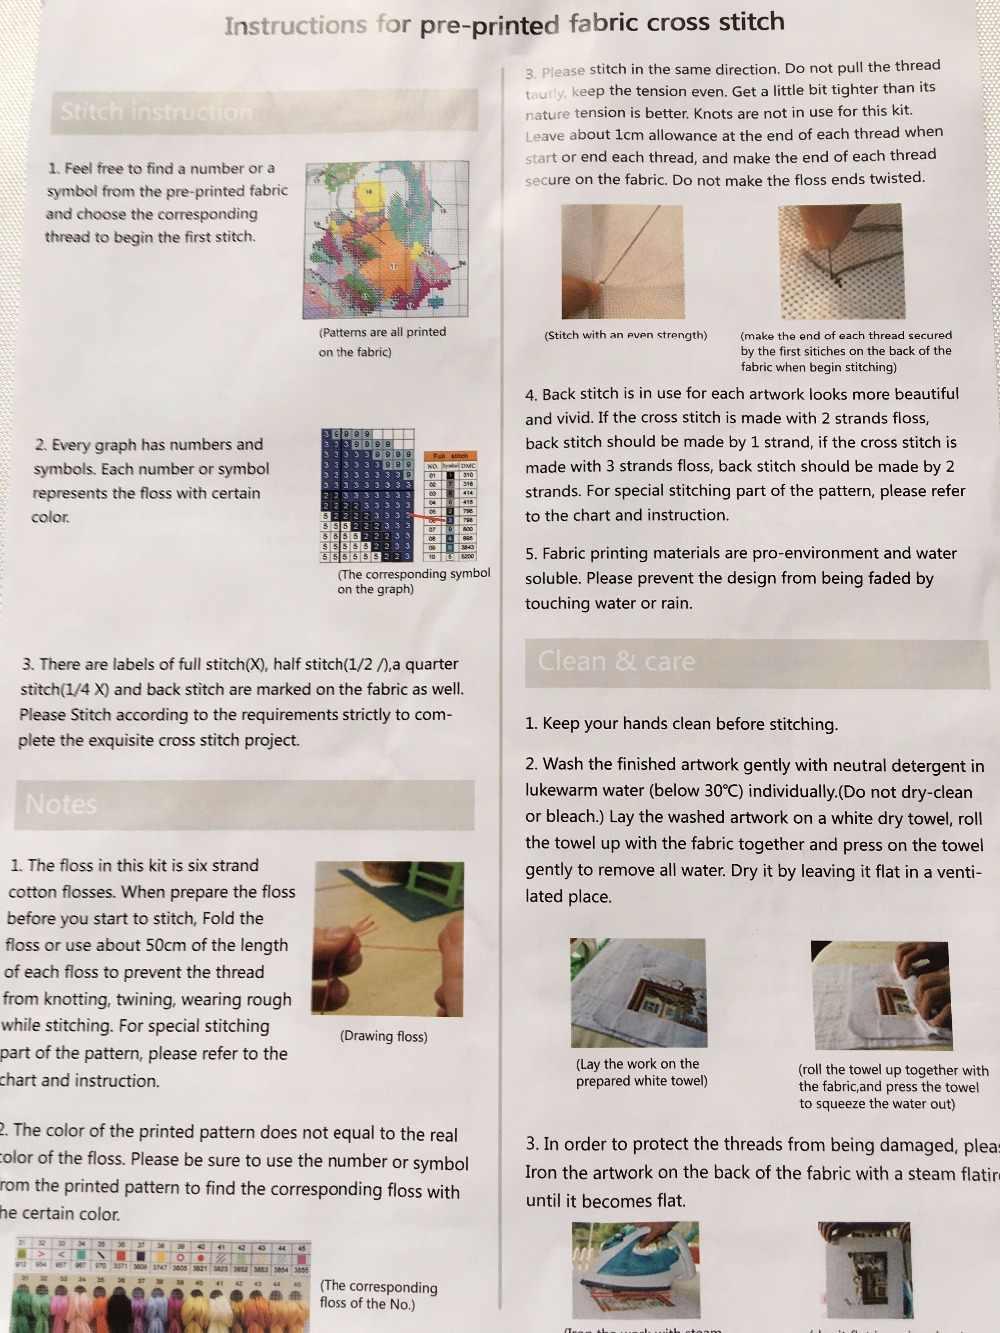 30*25Cm Handwerken Set Vol Borduurwerk Kit, populaire Telpatroon Bijna Perfect 3 Engeltjes Verf Muur Decor